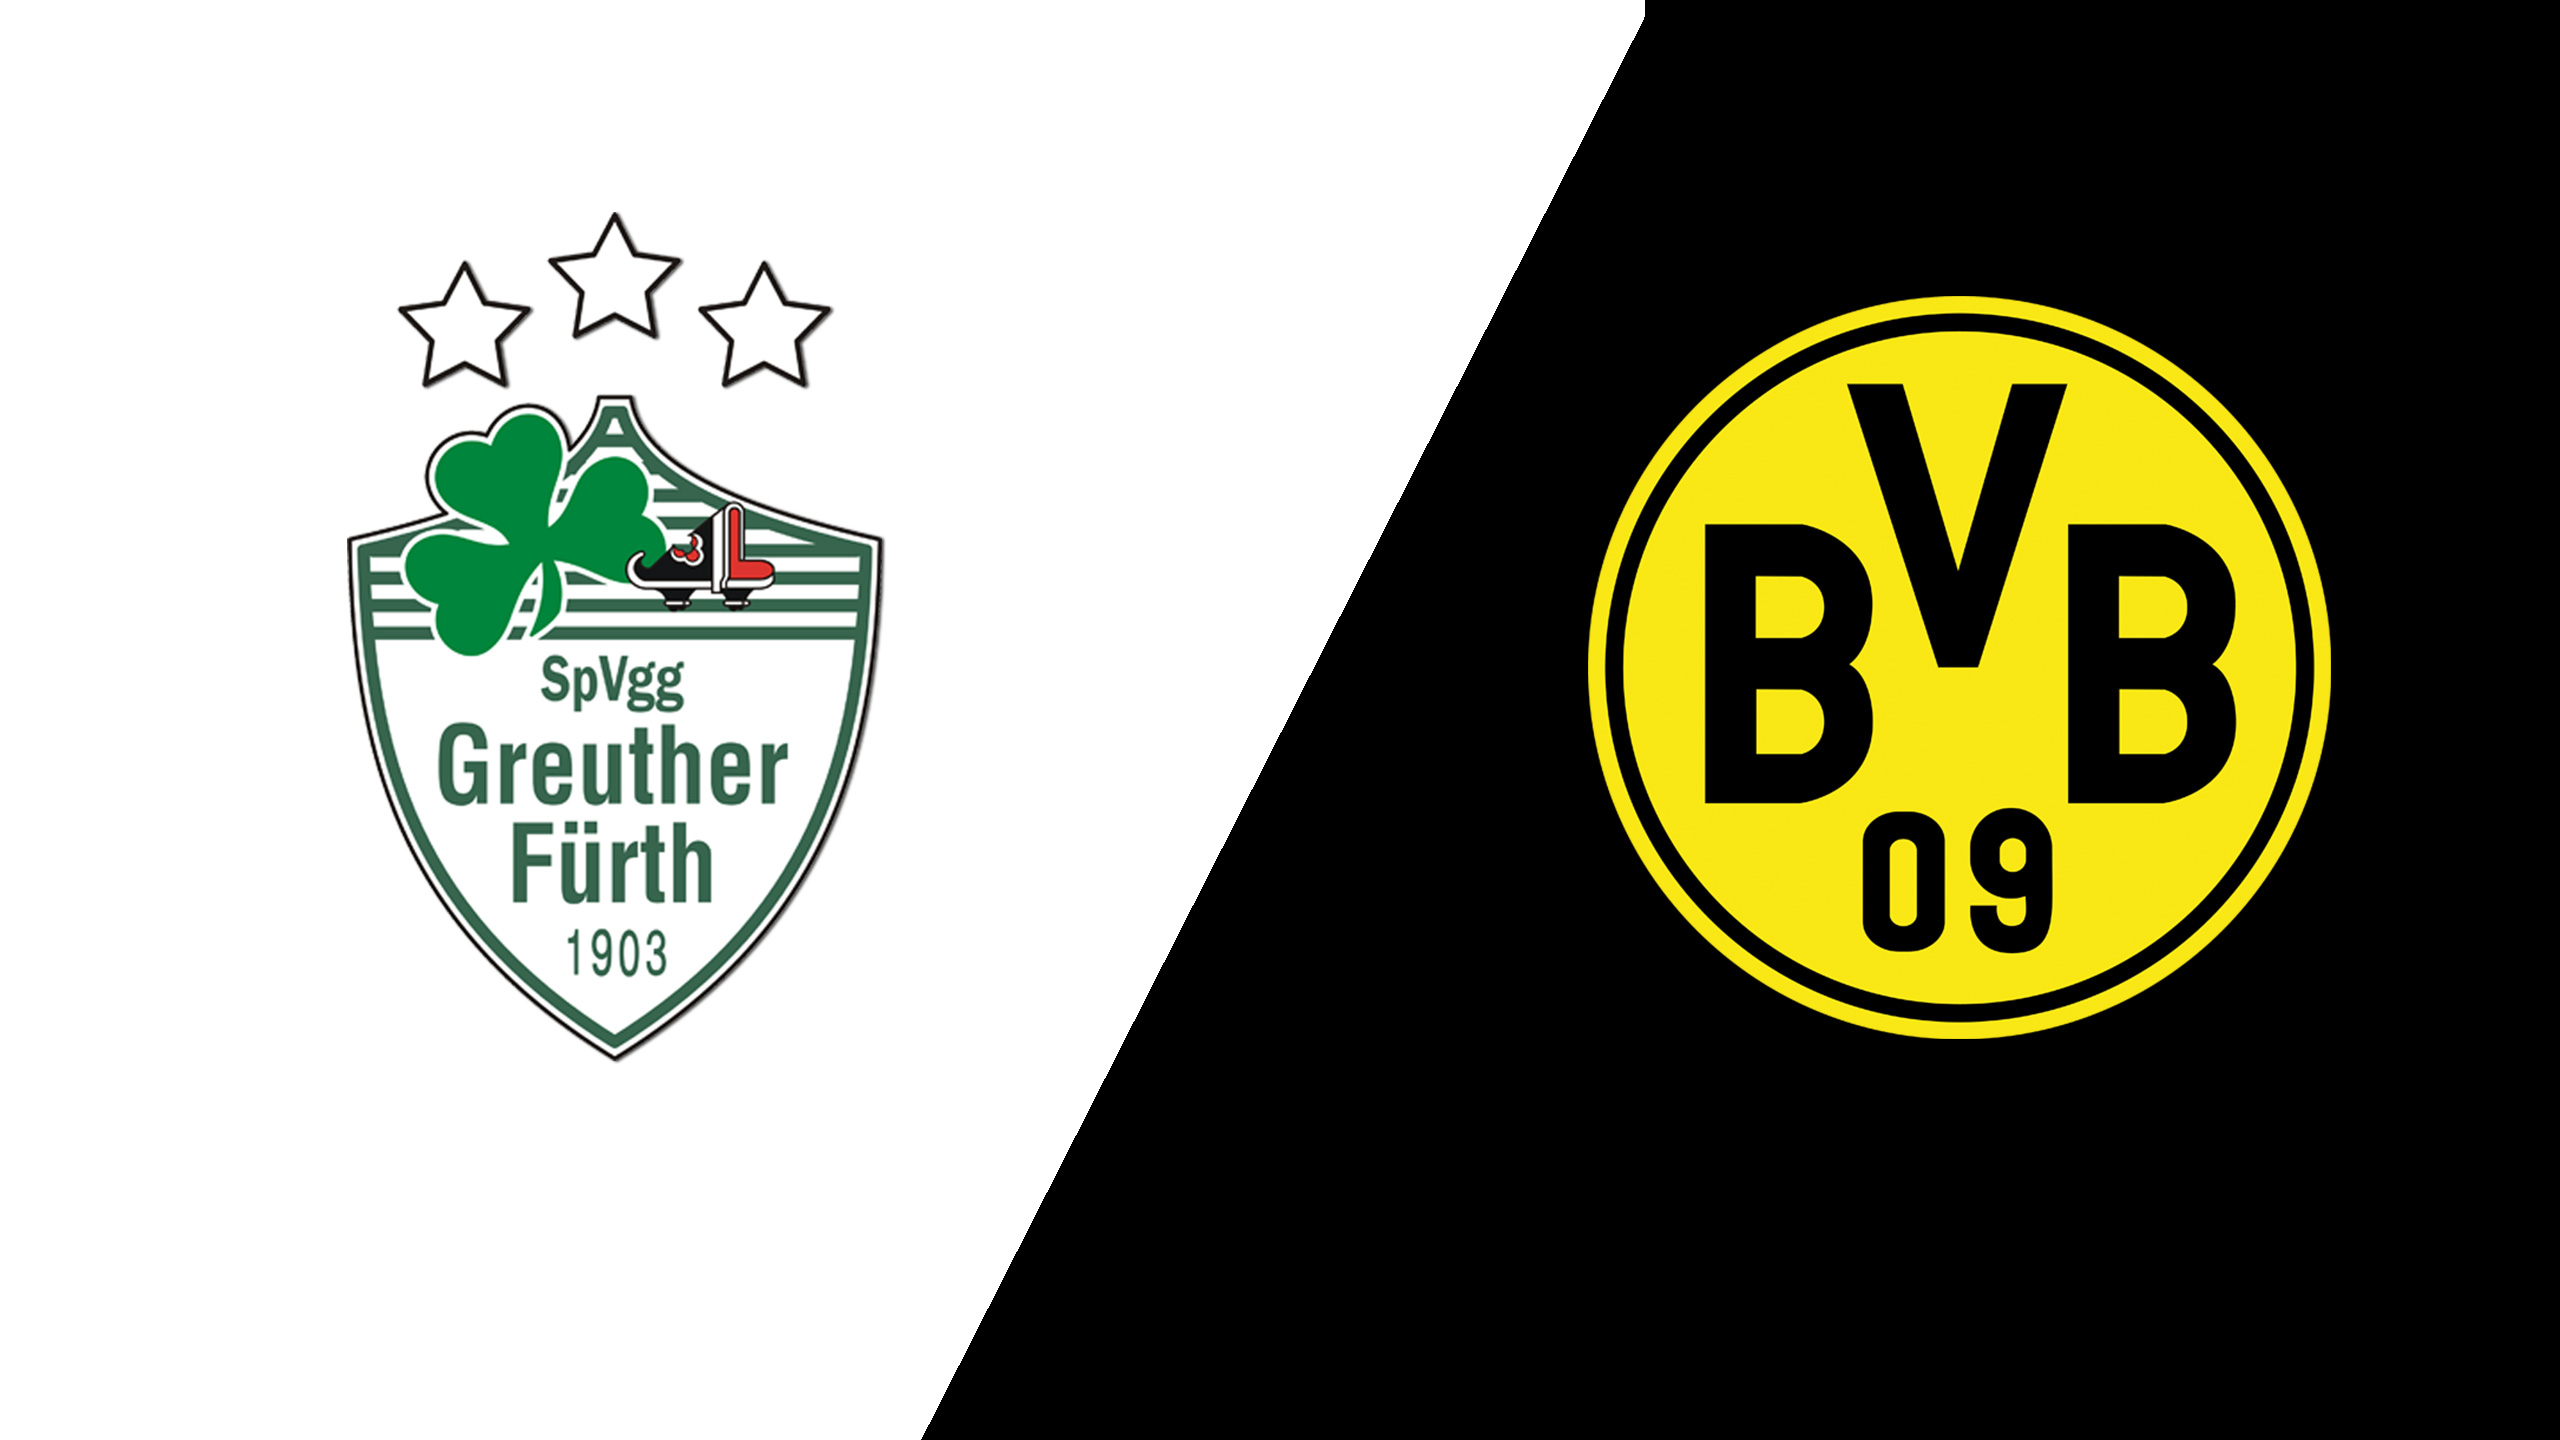 In Spanish - Greuther Furth vs. Borussia Dortmund (Round 1) (German Cup)